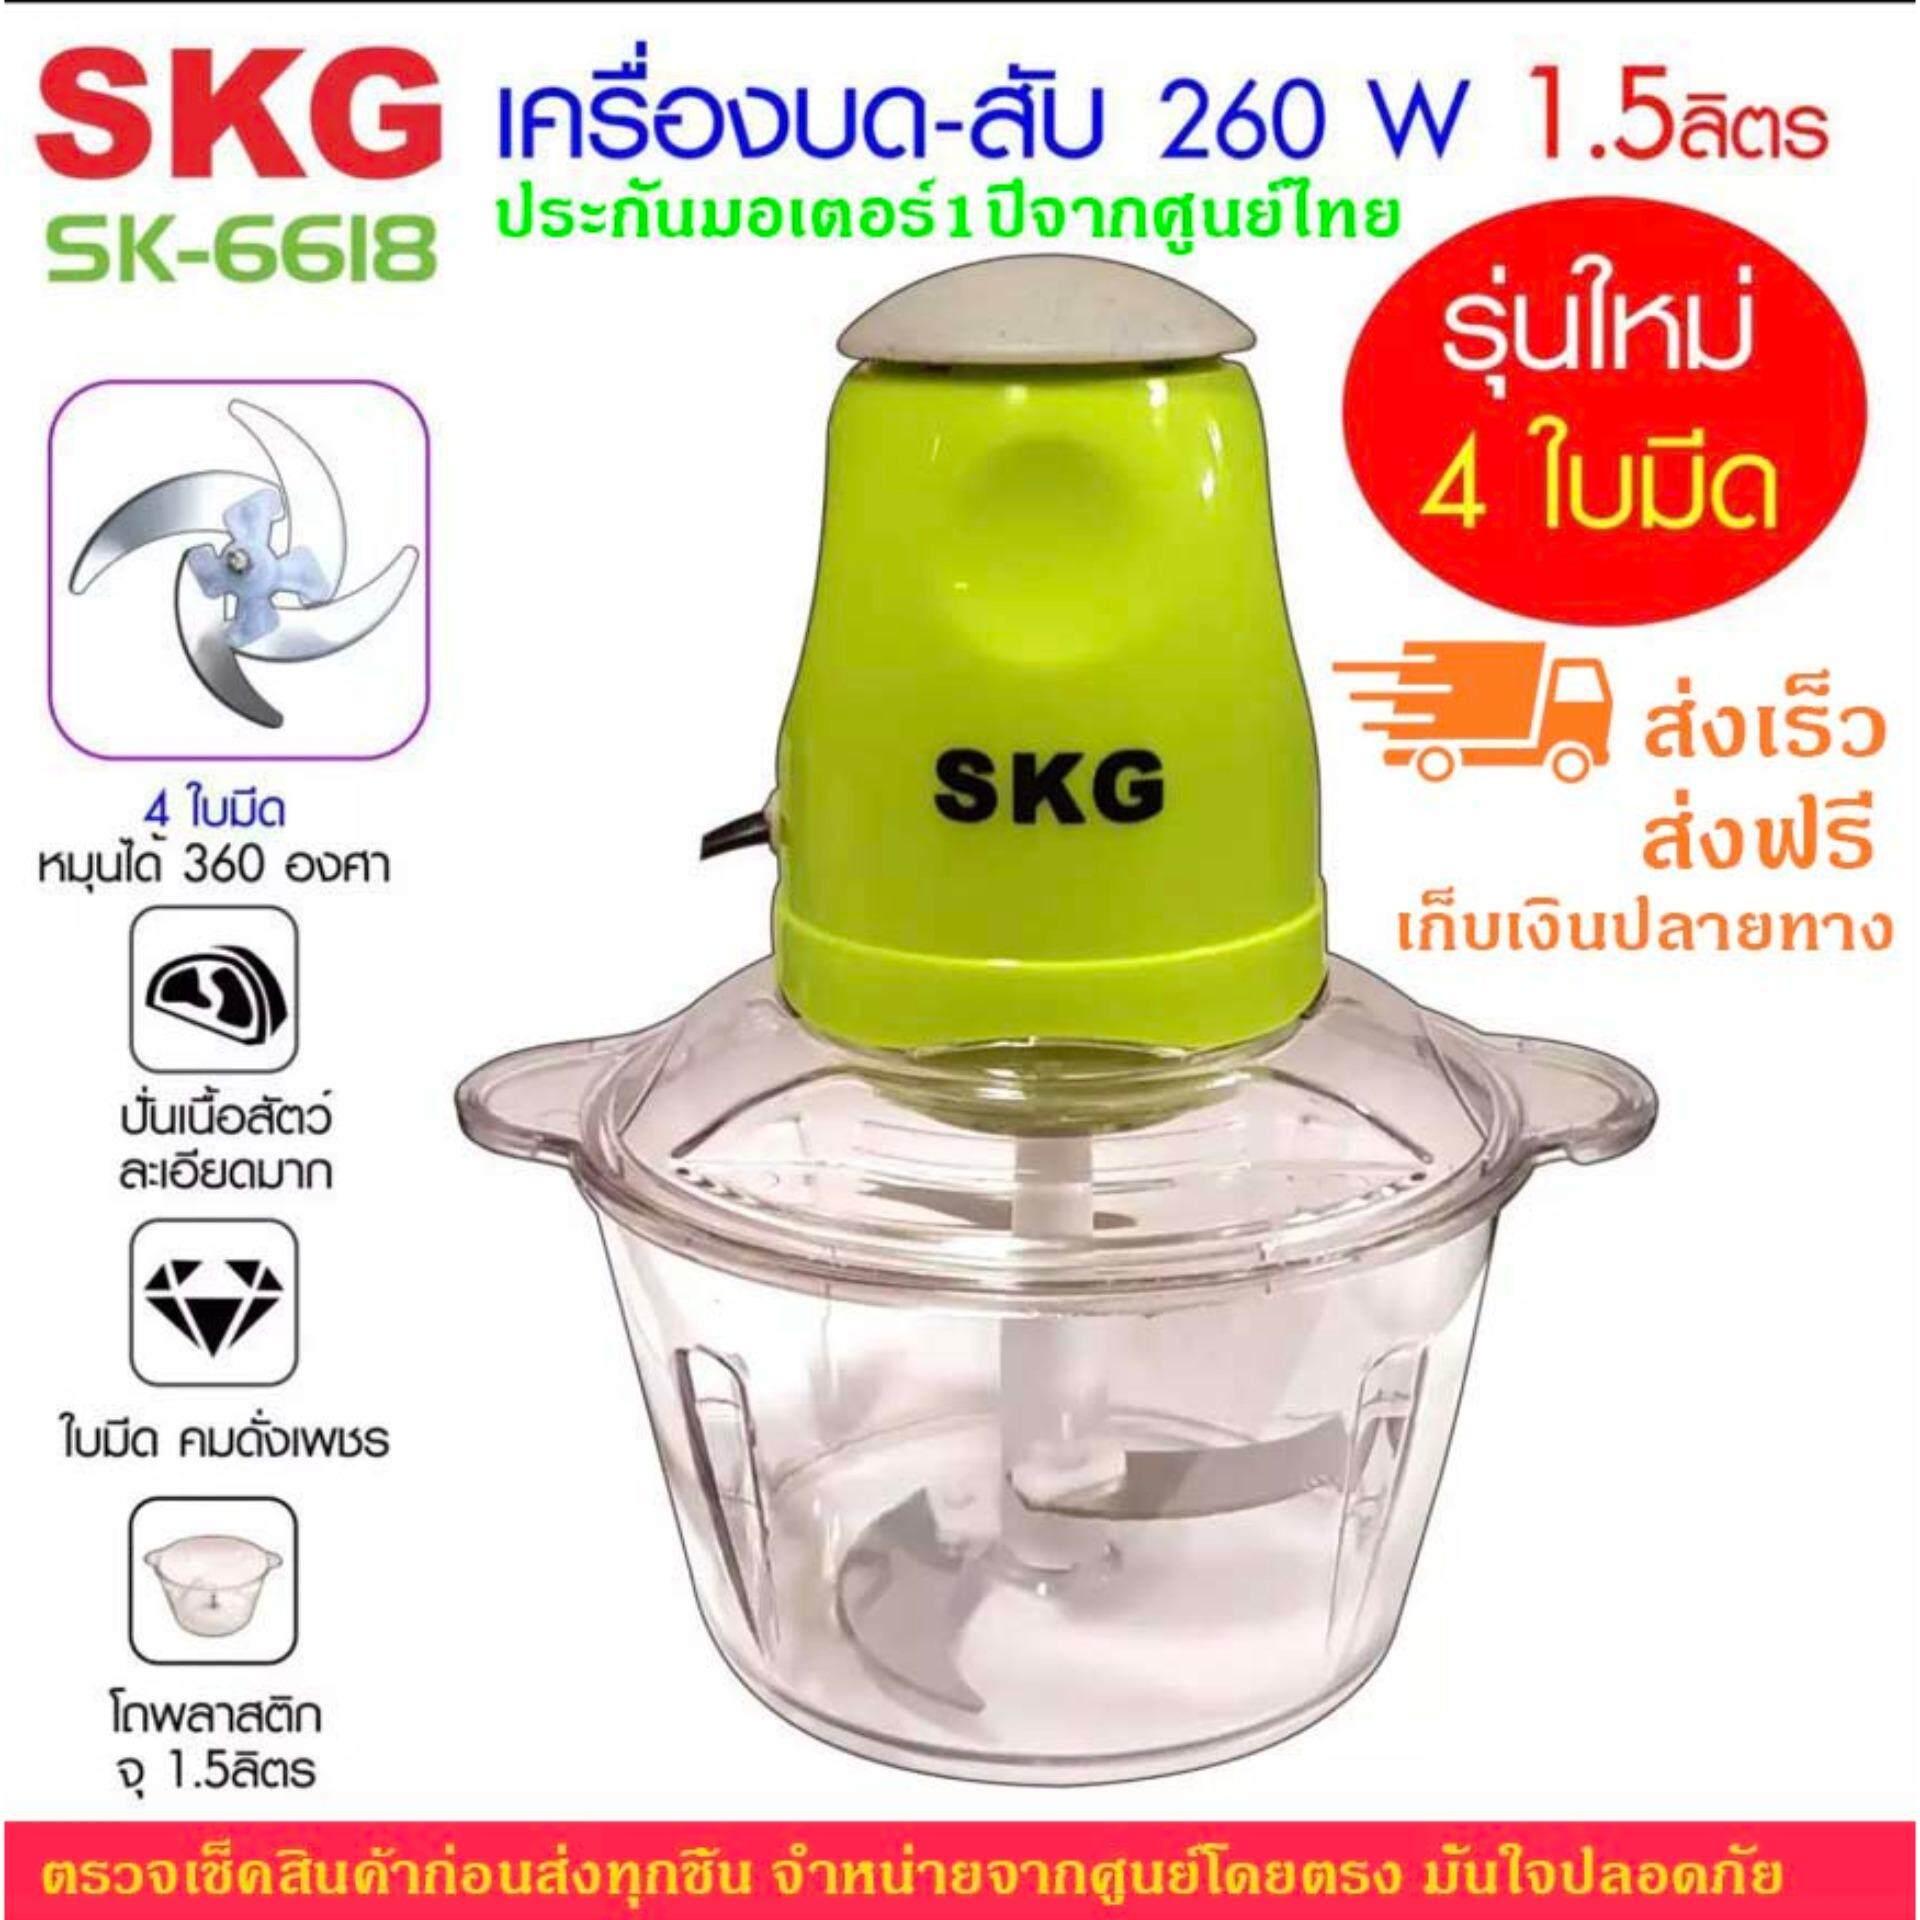 SKG เครื่องบด-สับไฟฟ้า ใบมีด4ใบ รุ่นใหม่ รุ่น SK-6618